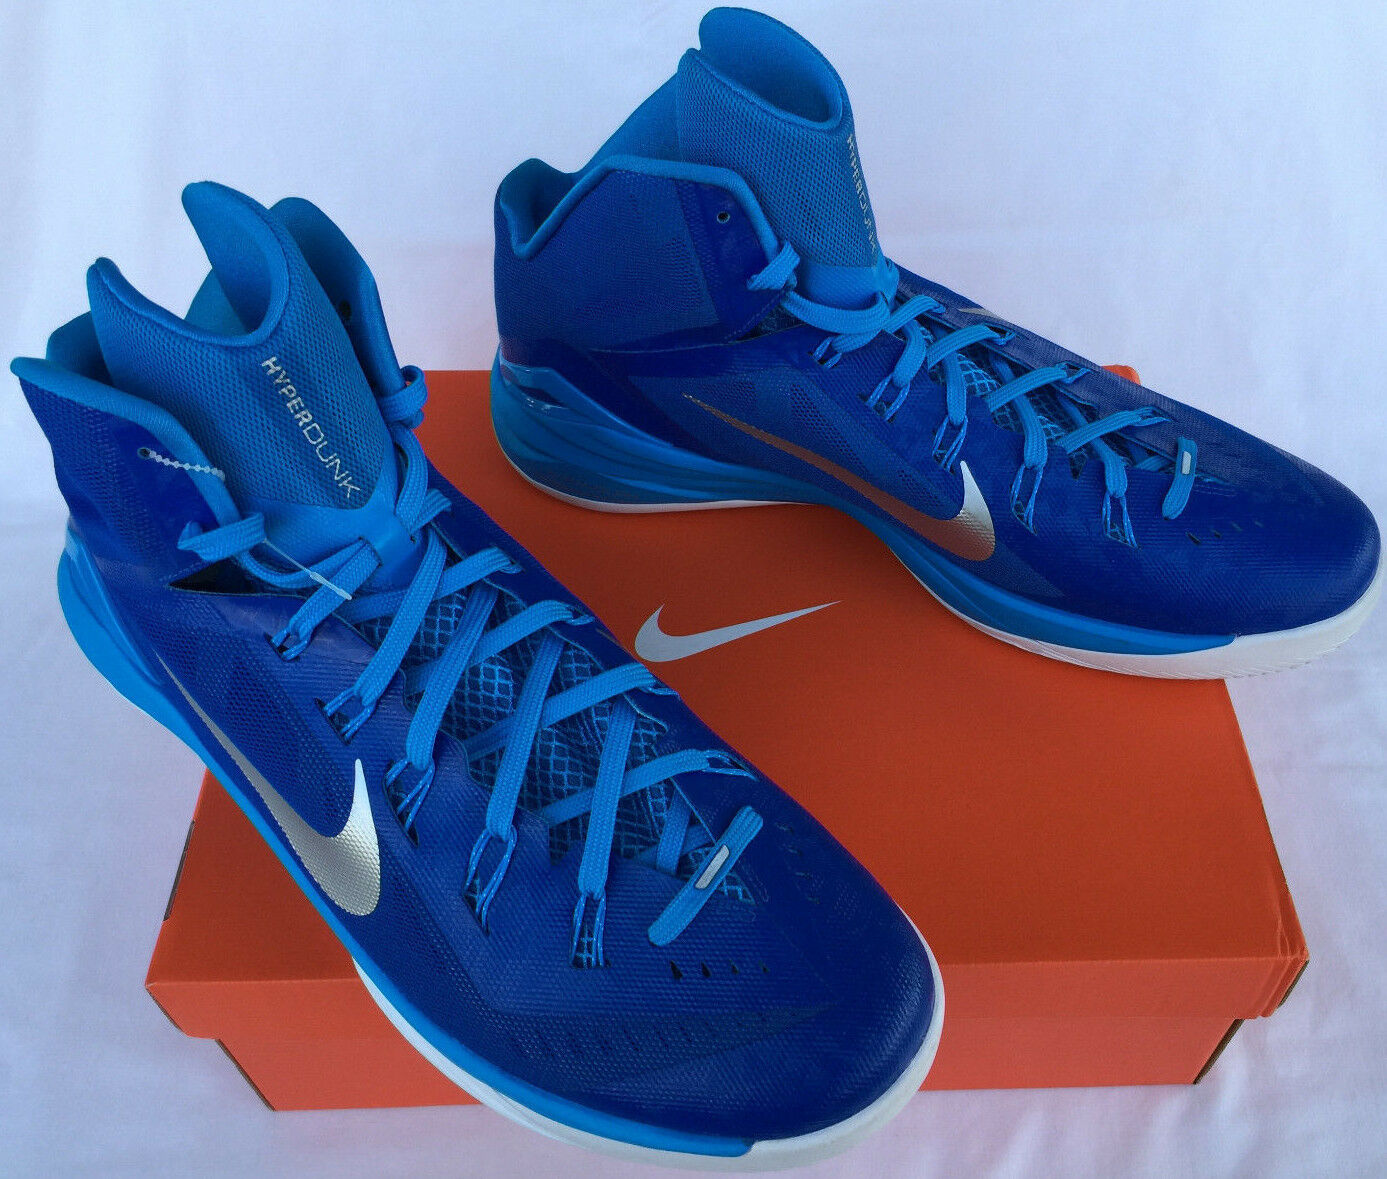 Nike hyperdunk tbc 2014 gioco reale 653483-404 blu, scarpe da basket ncaa maschile 18